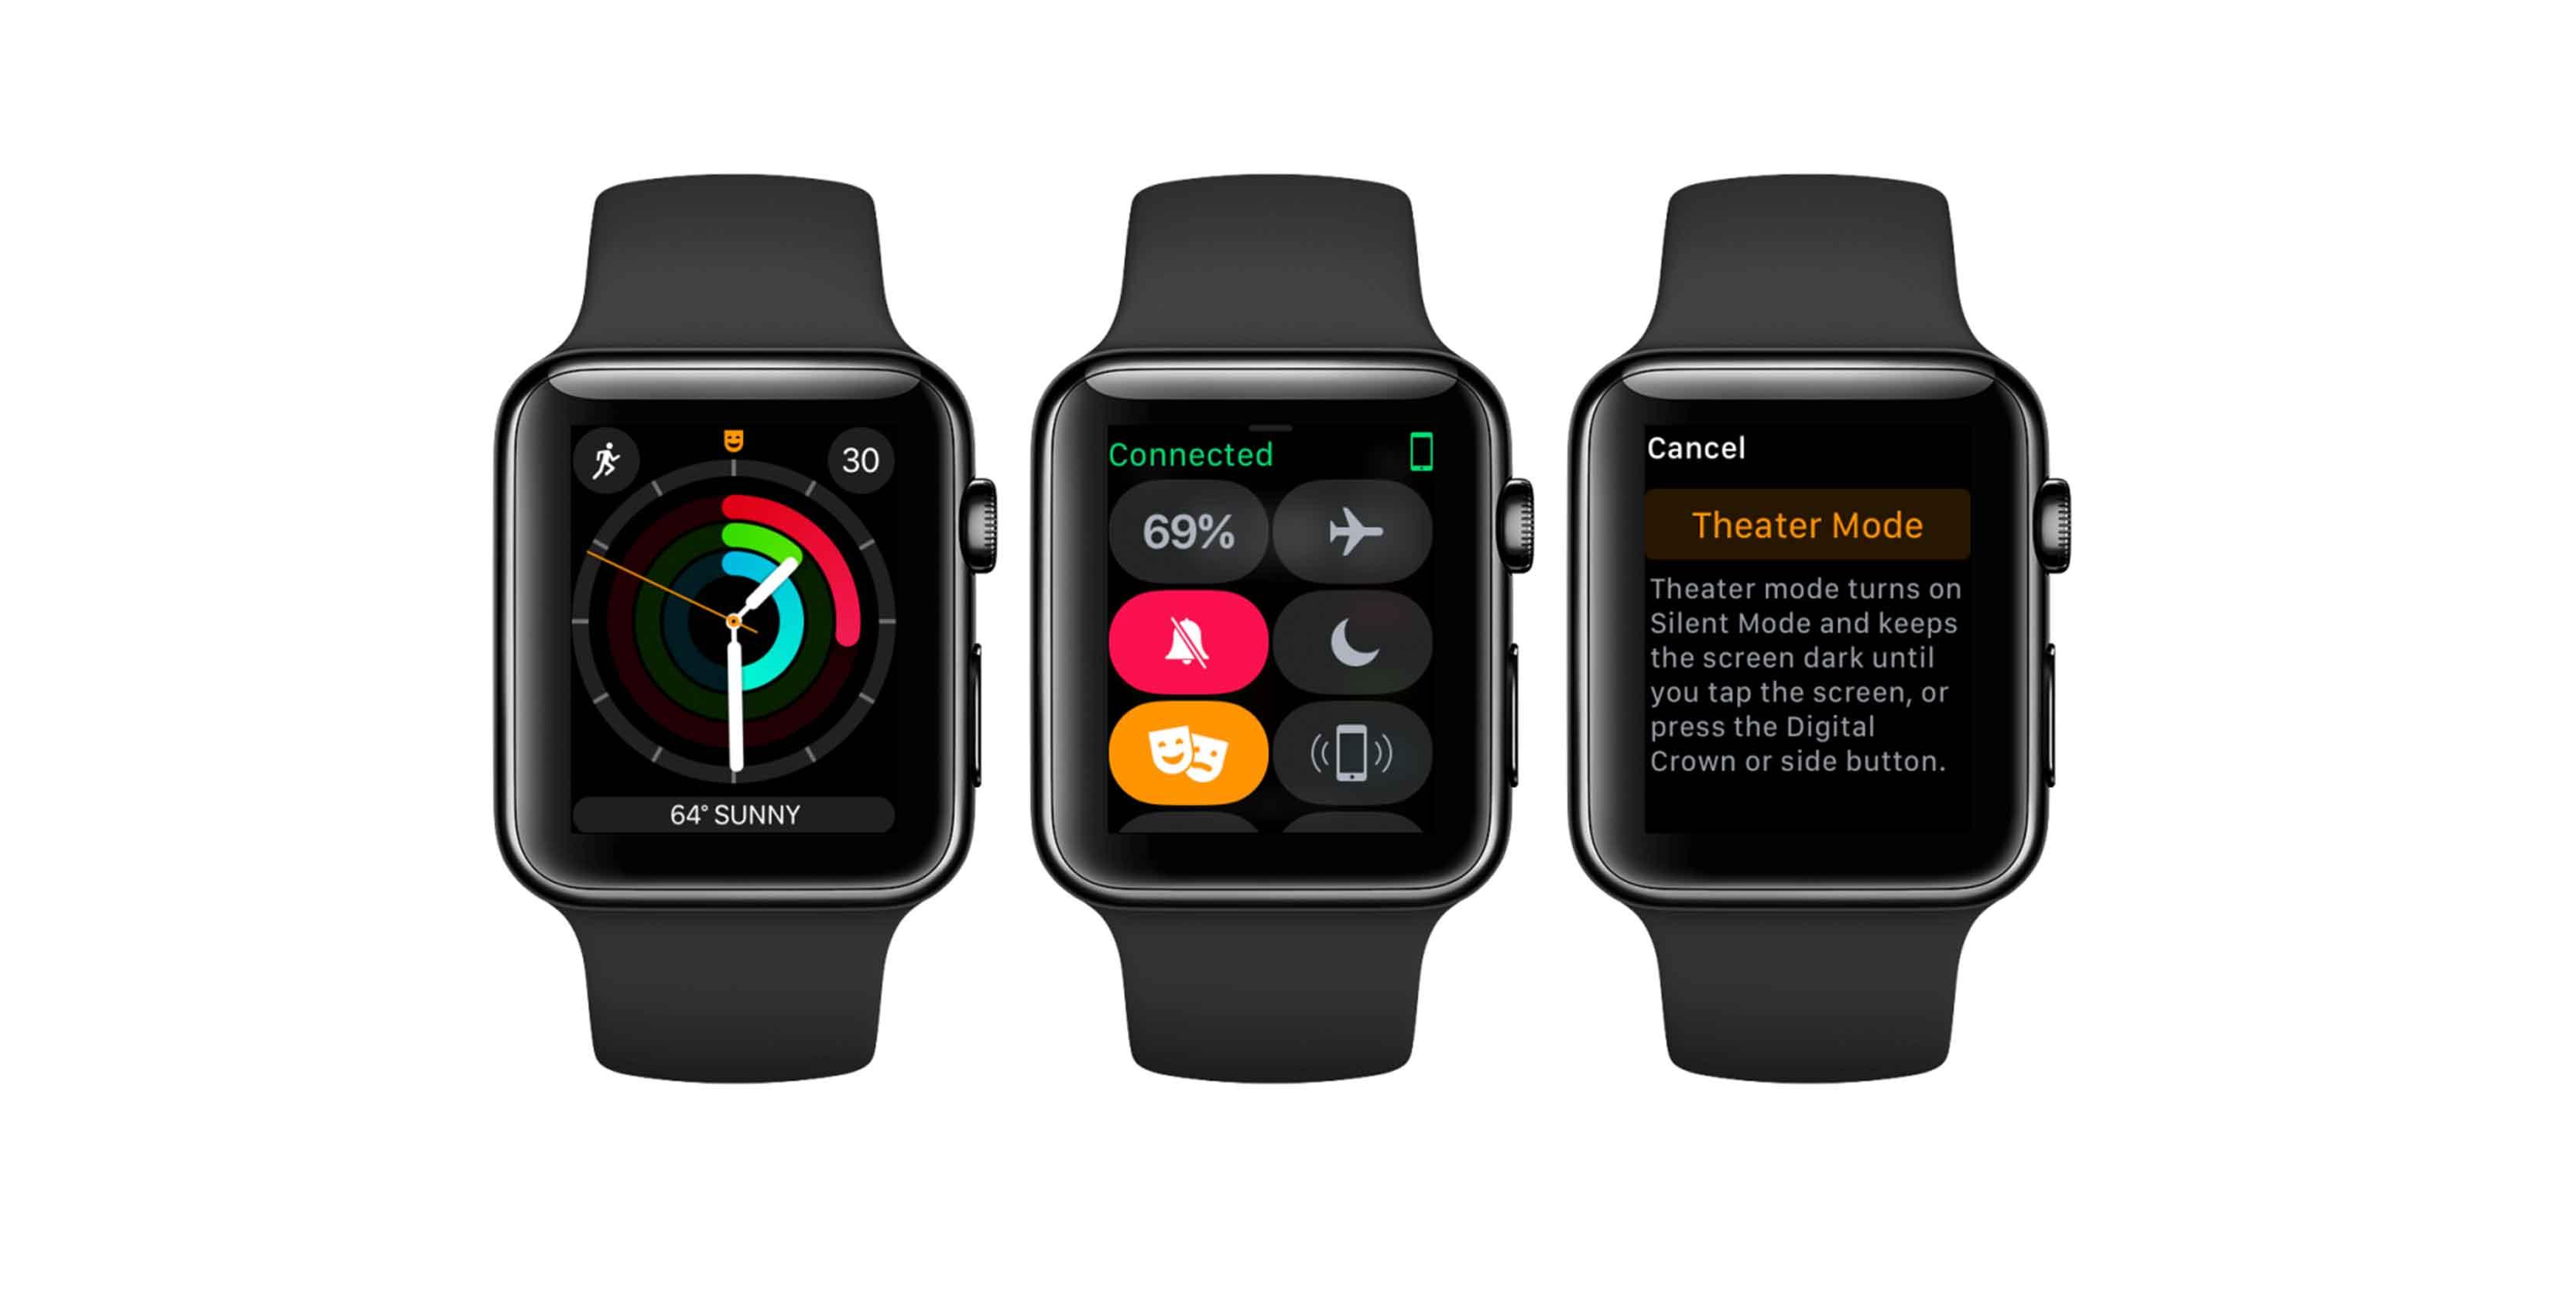 apple watchos 3.2